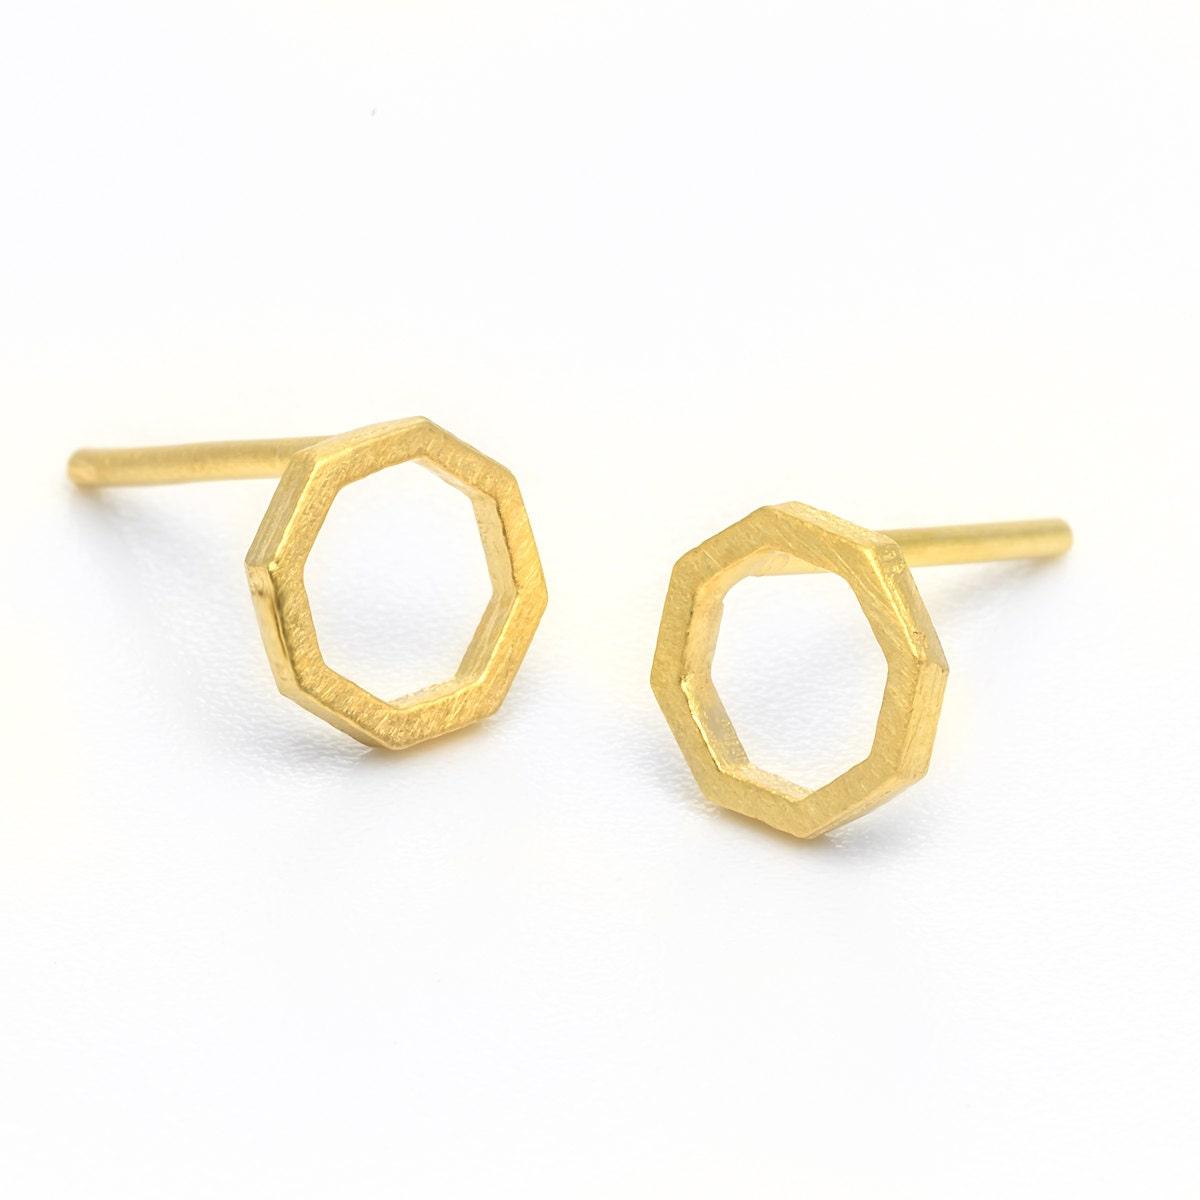 Gold stud earrings octagon studs gold geometric studs 14k